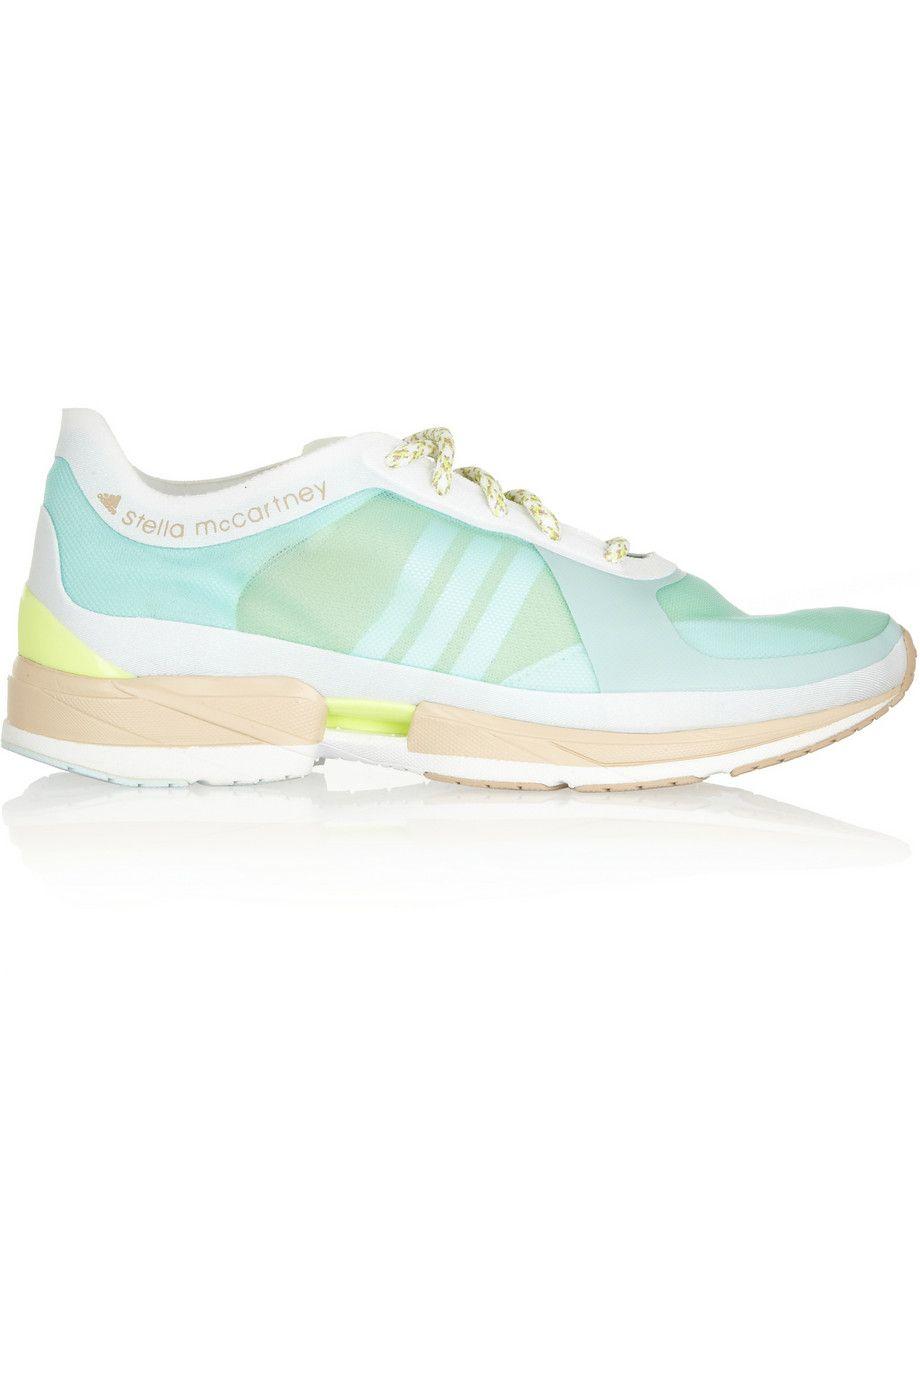 Adidas by Stella McCartney adizero II Mesh zapatillas 160 http: / / beta